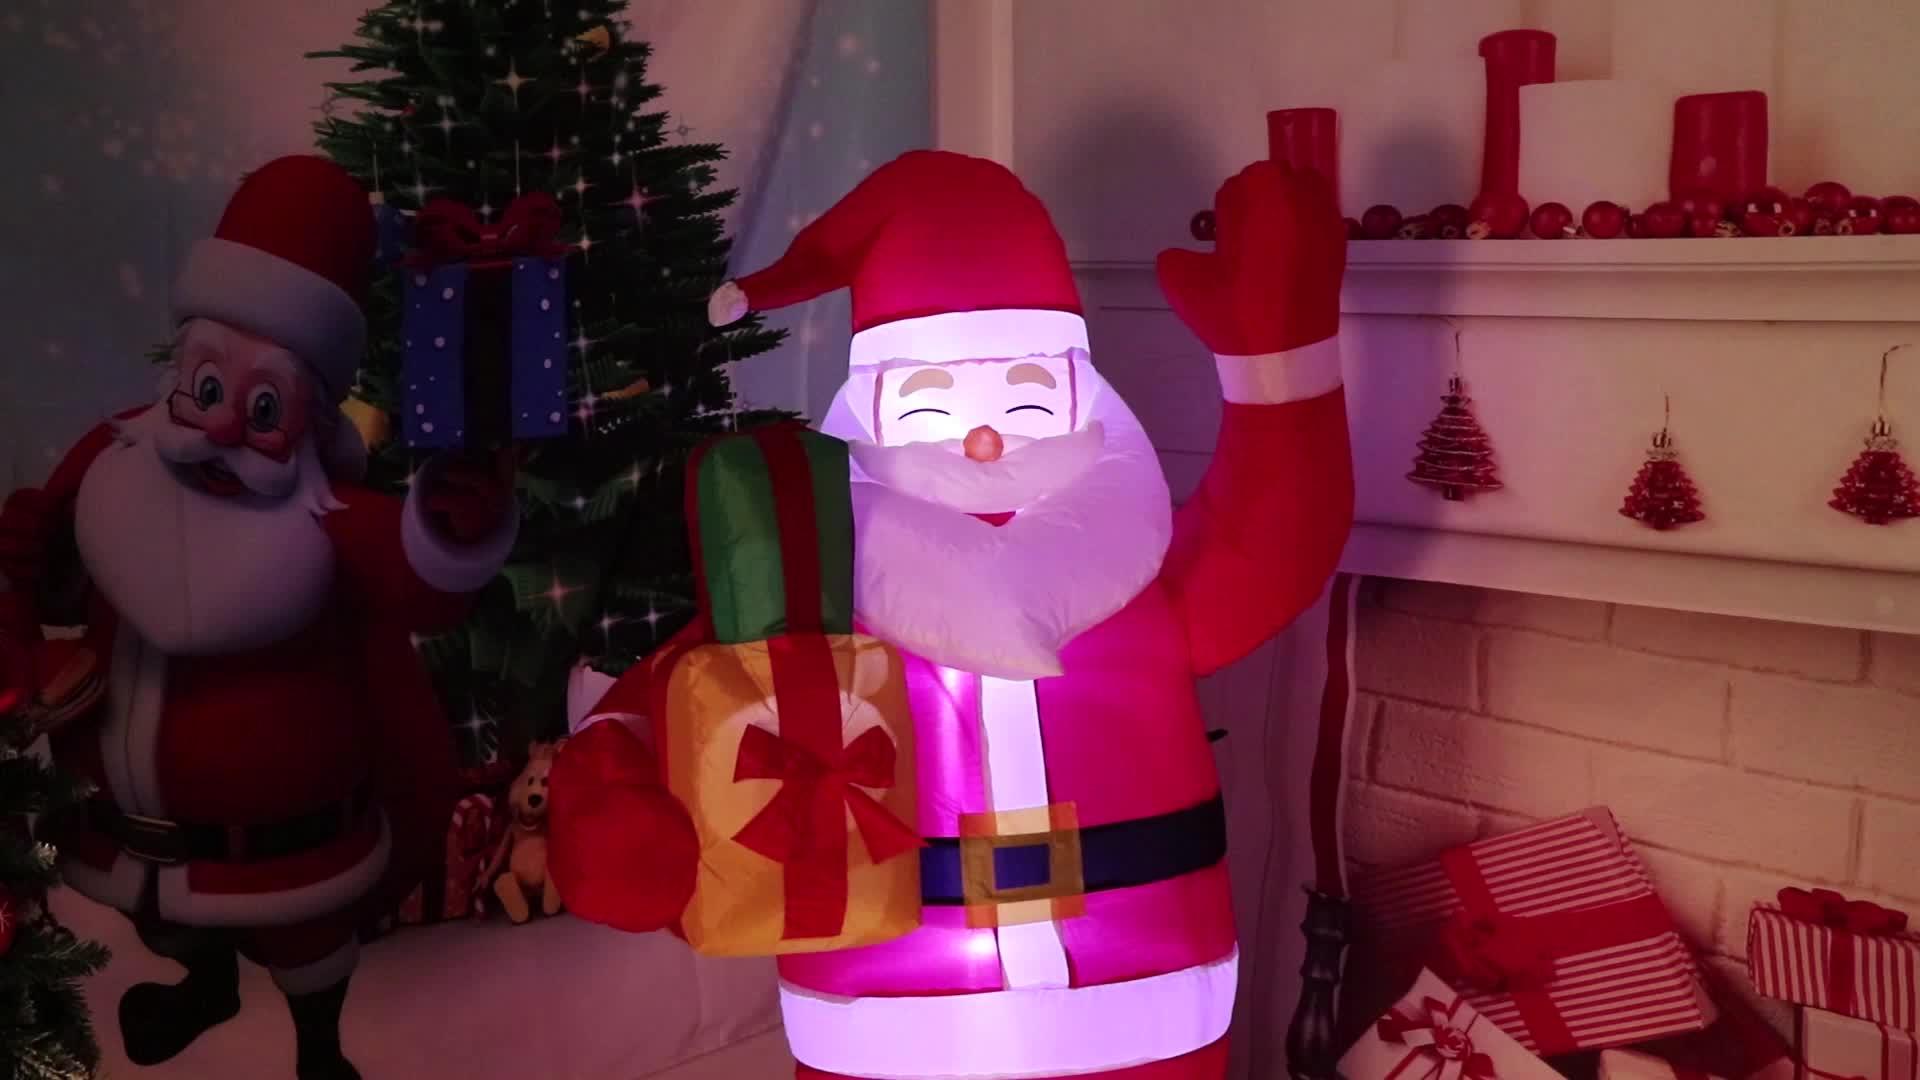 Ourwarm 5ft 야외 크리스마스 장식 LED 조명 풍선 산타 클로스